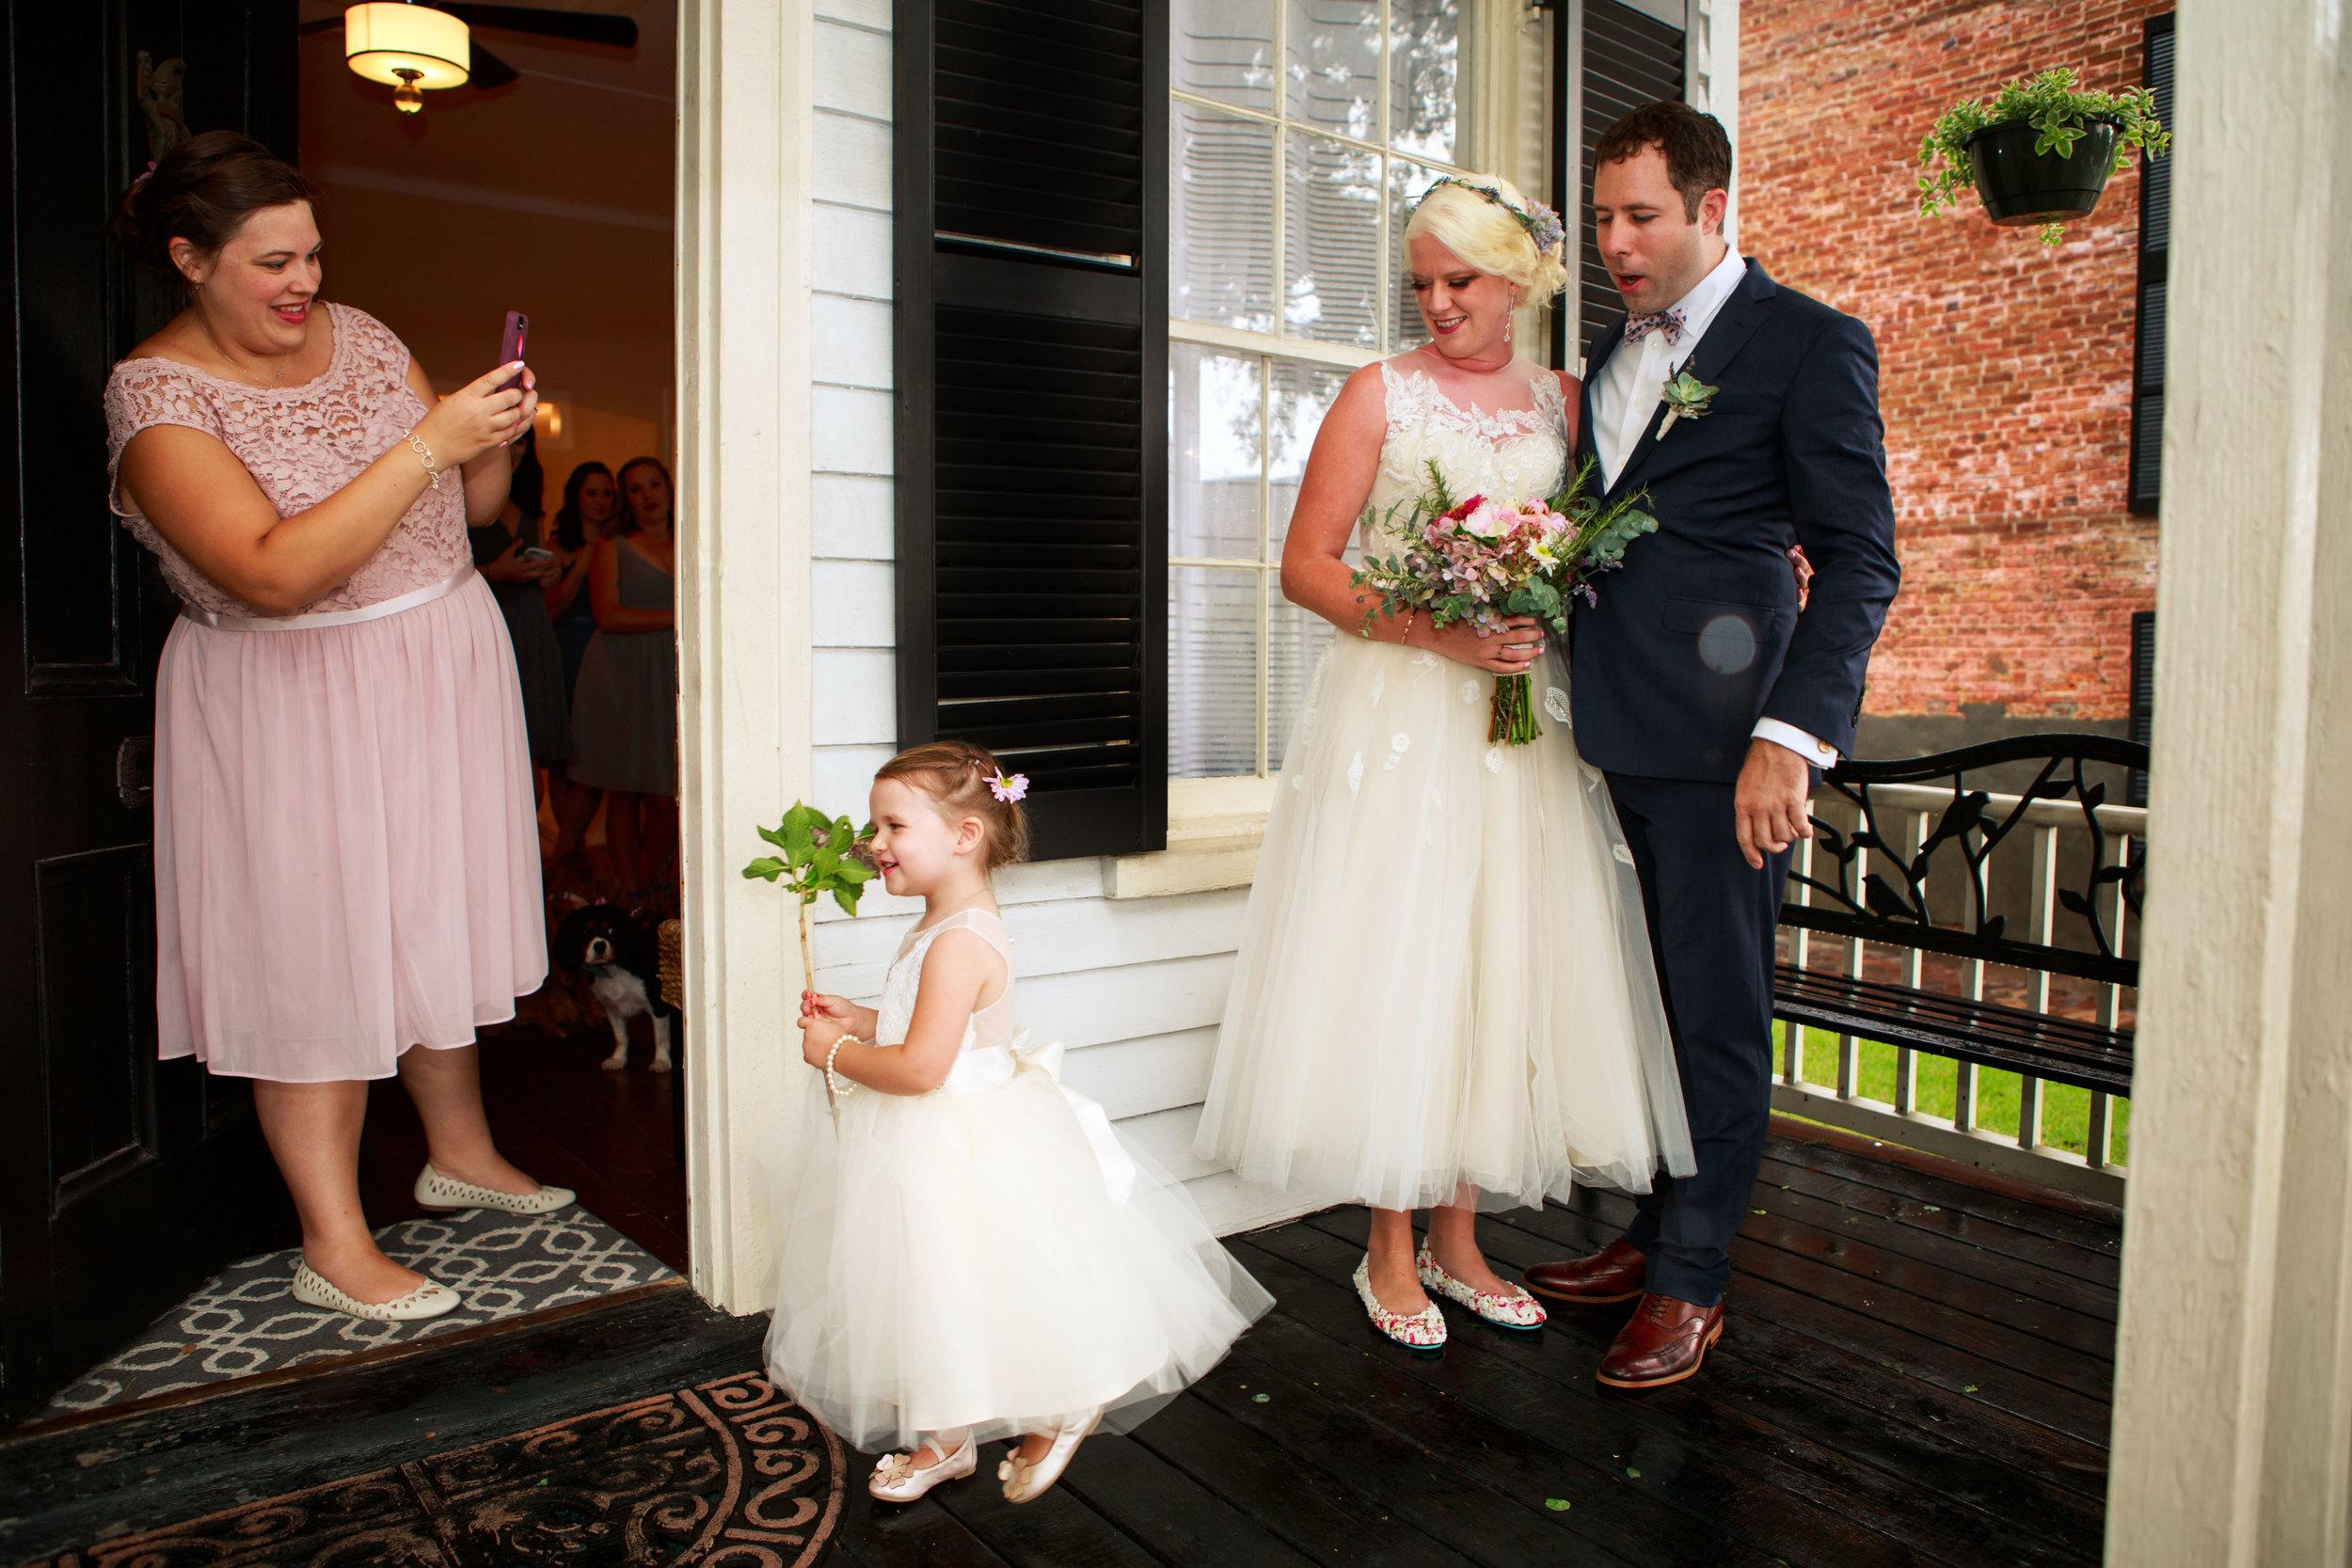 128-South-Wedding-Tiffany-Abruzzo-Photography-First-Look-12.jpg